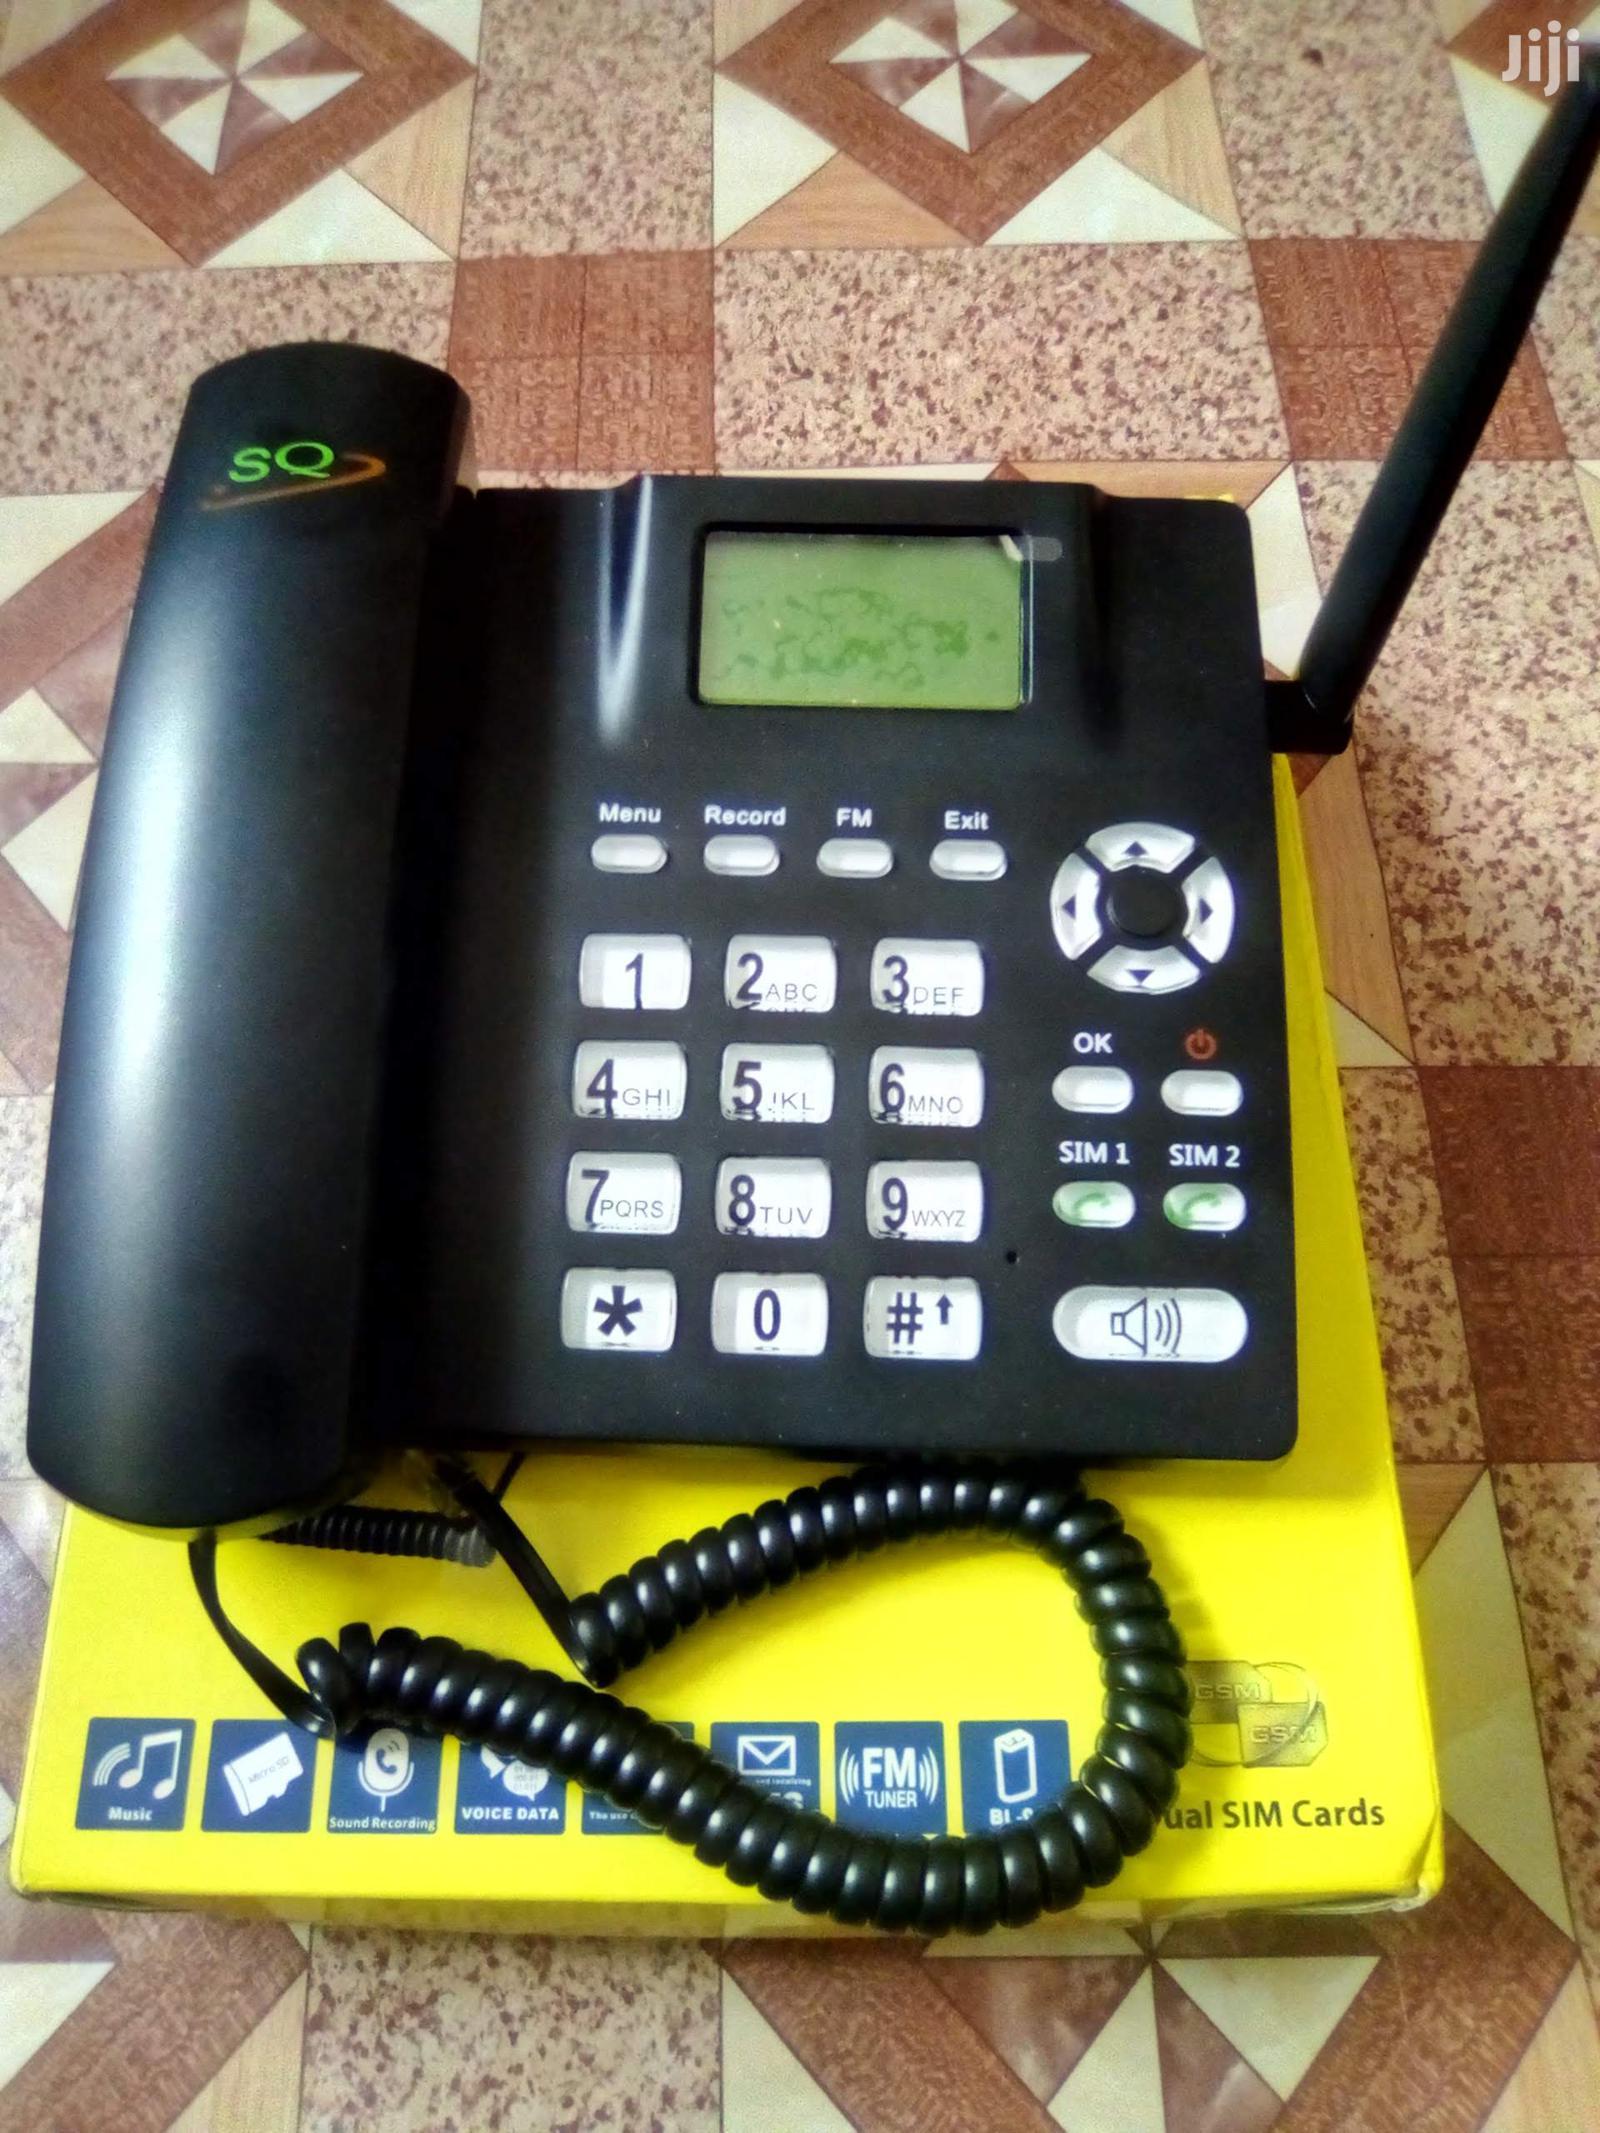 Archive: Home/Office Desktop Mobile Phone Black